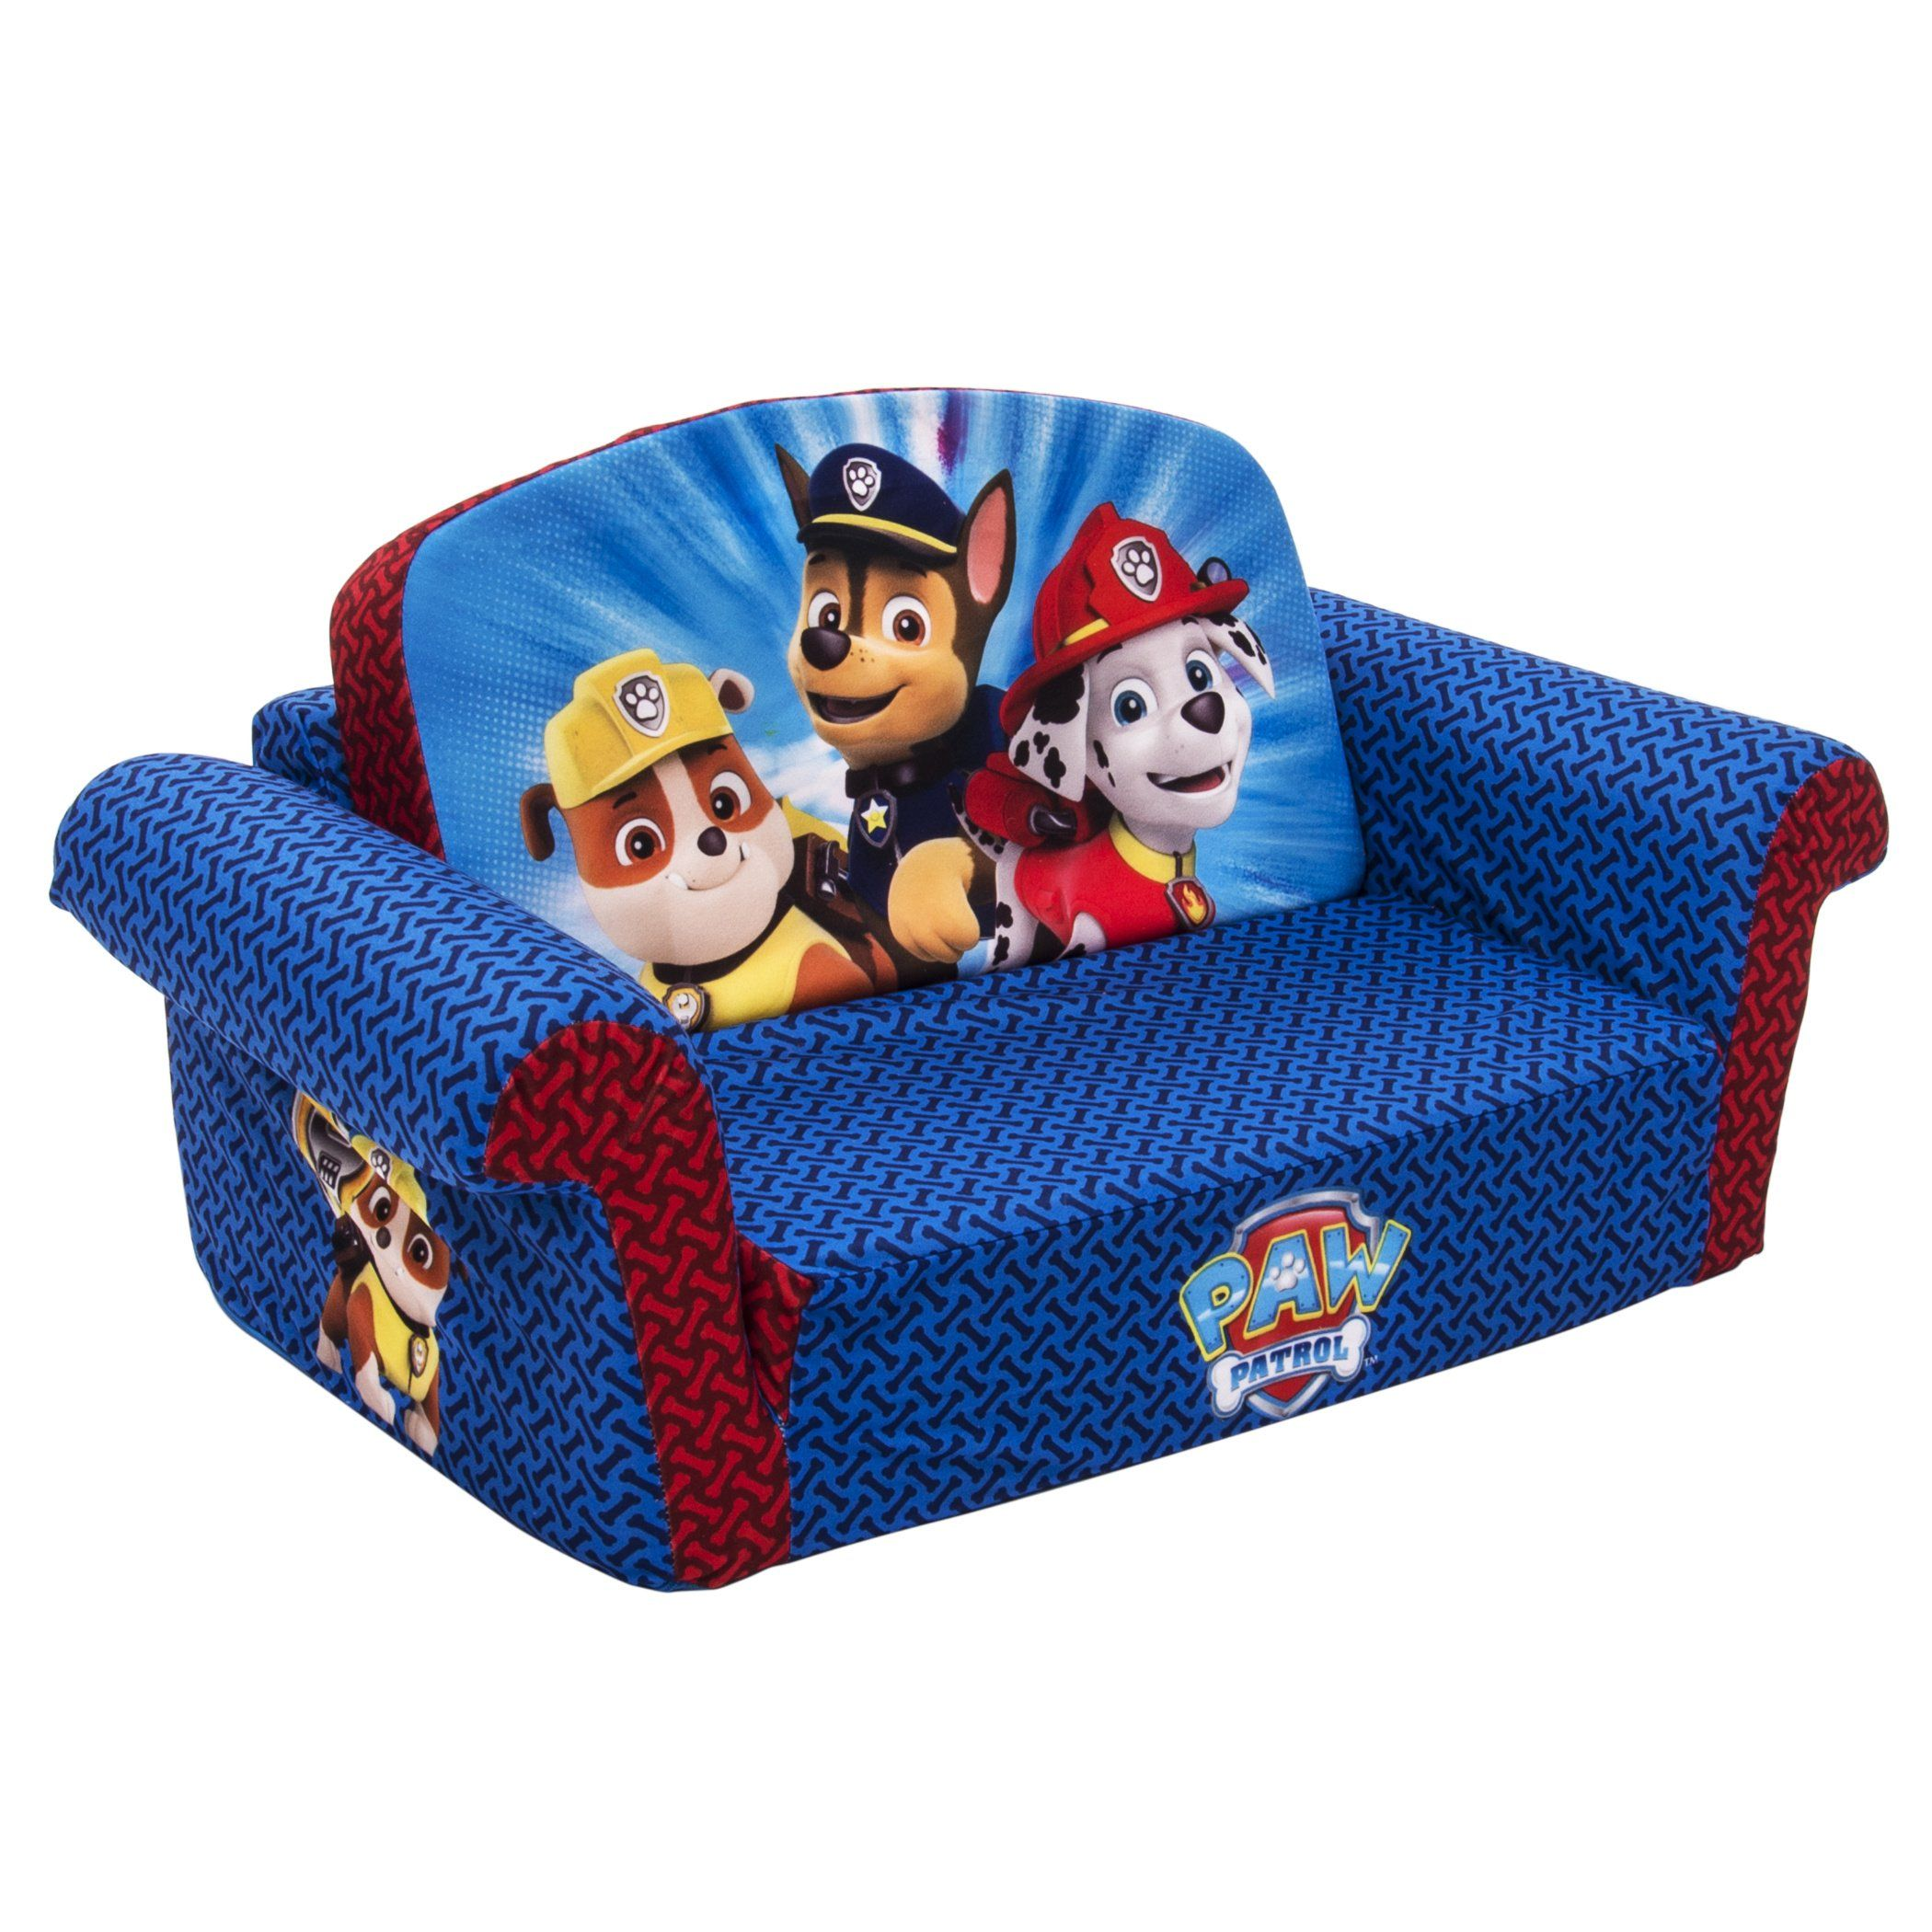 paw patrol flip open sofa target contemporary modern living room sofas amazon marshmallow children 39s furniture